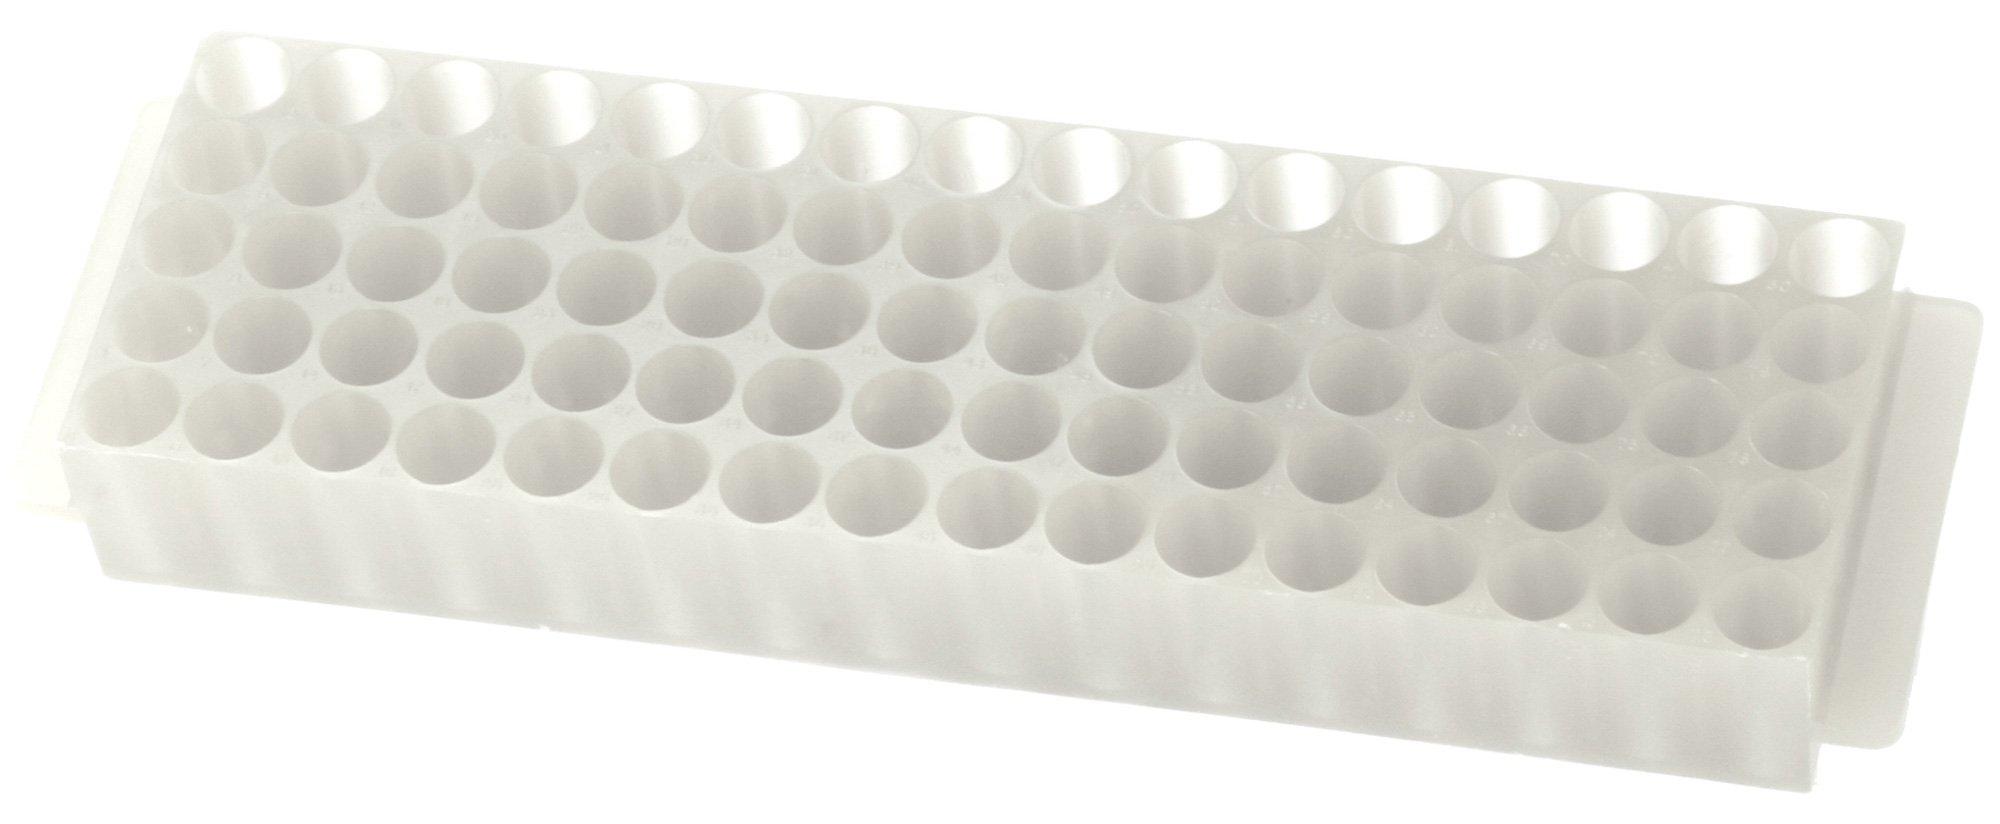 80-Well Microcentrifuge Tube Rack - Natural